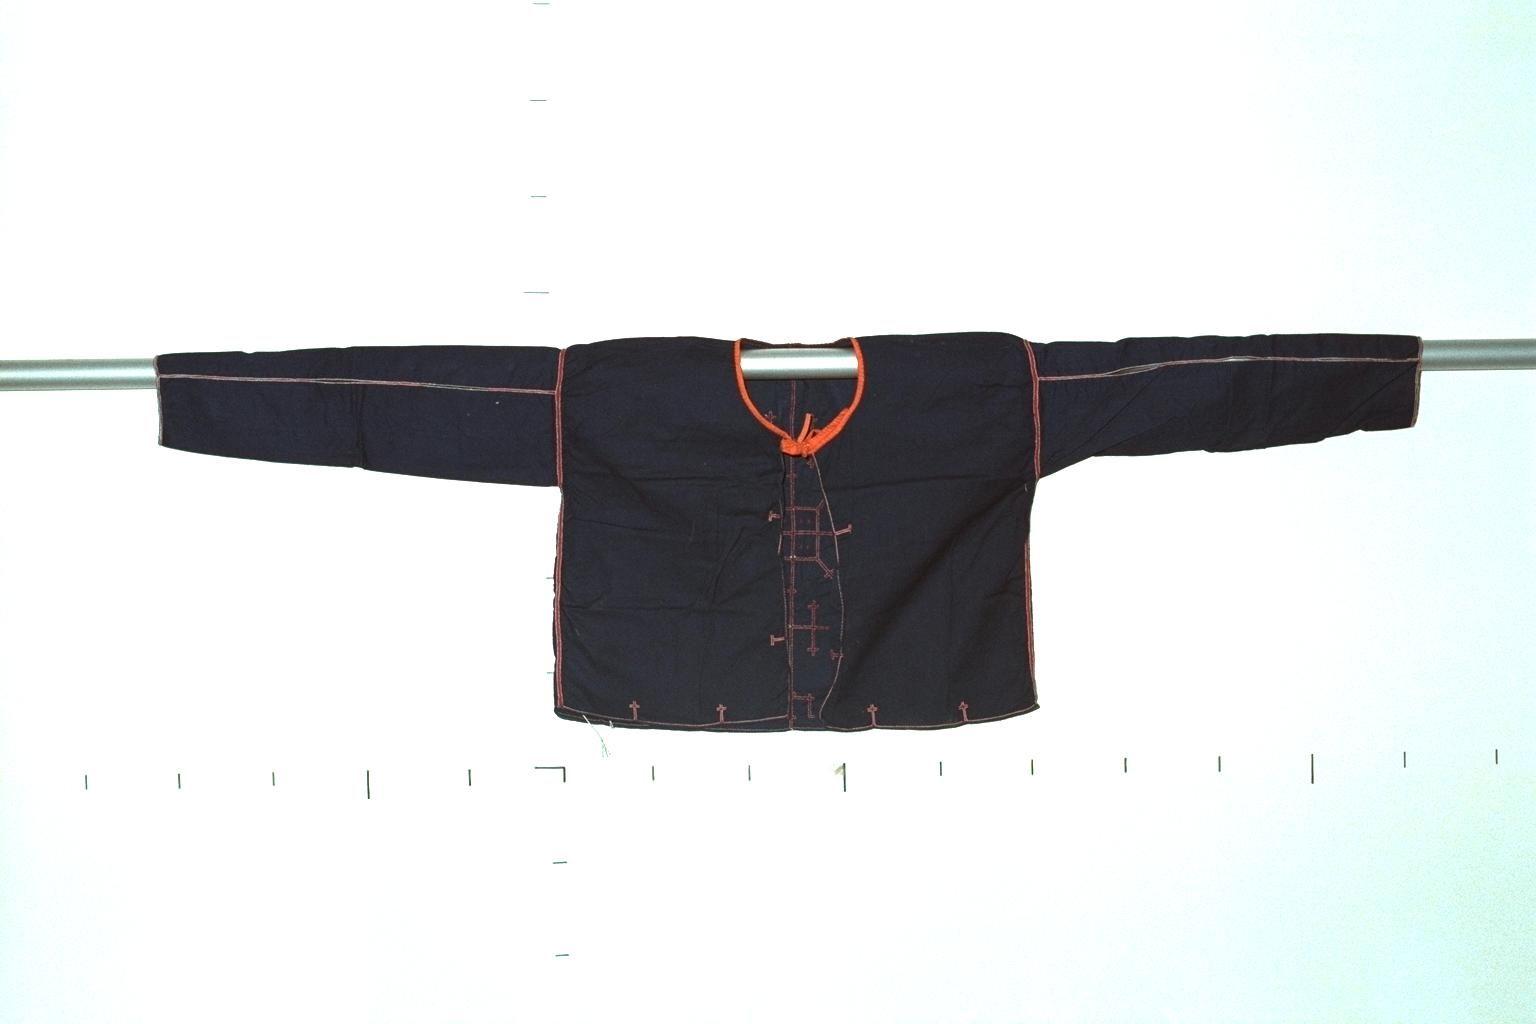 Hanunoo-Mangyan men's shirt /National Museum of Ethnology